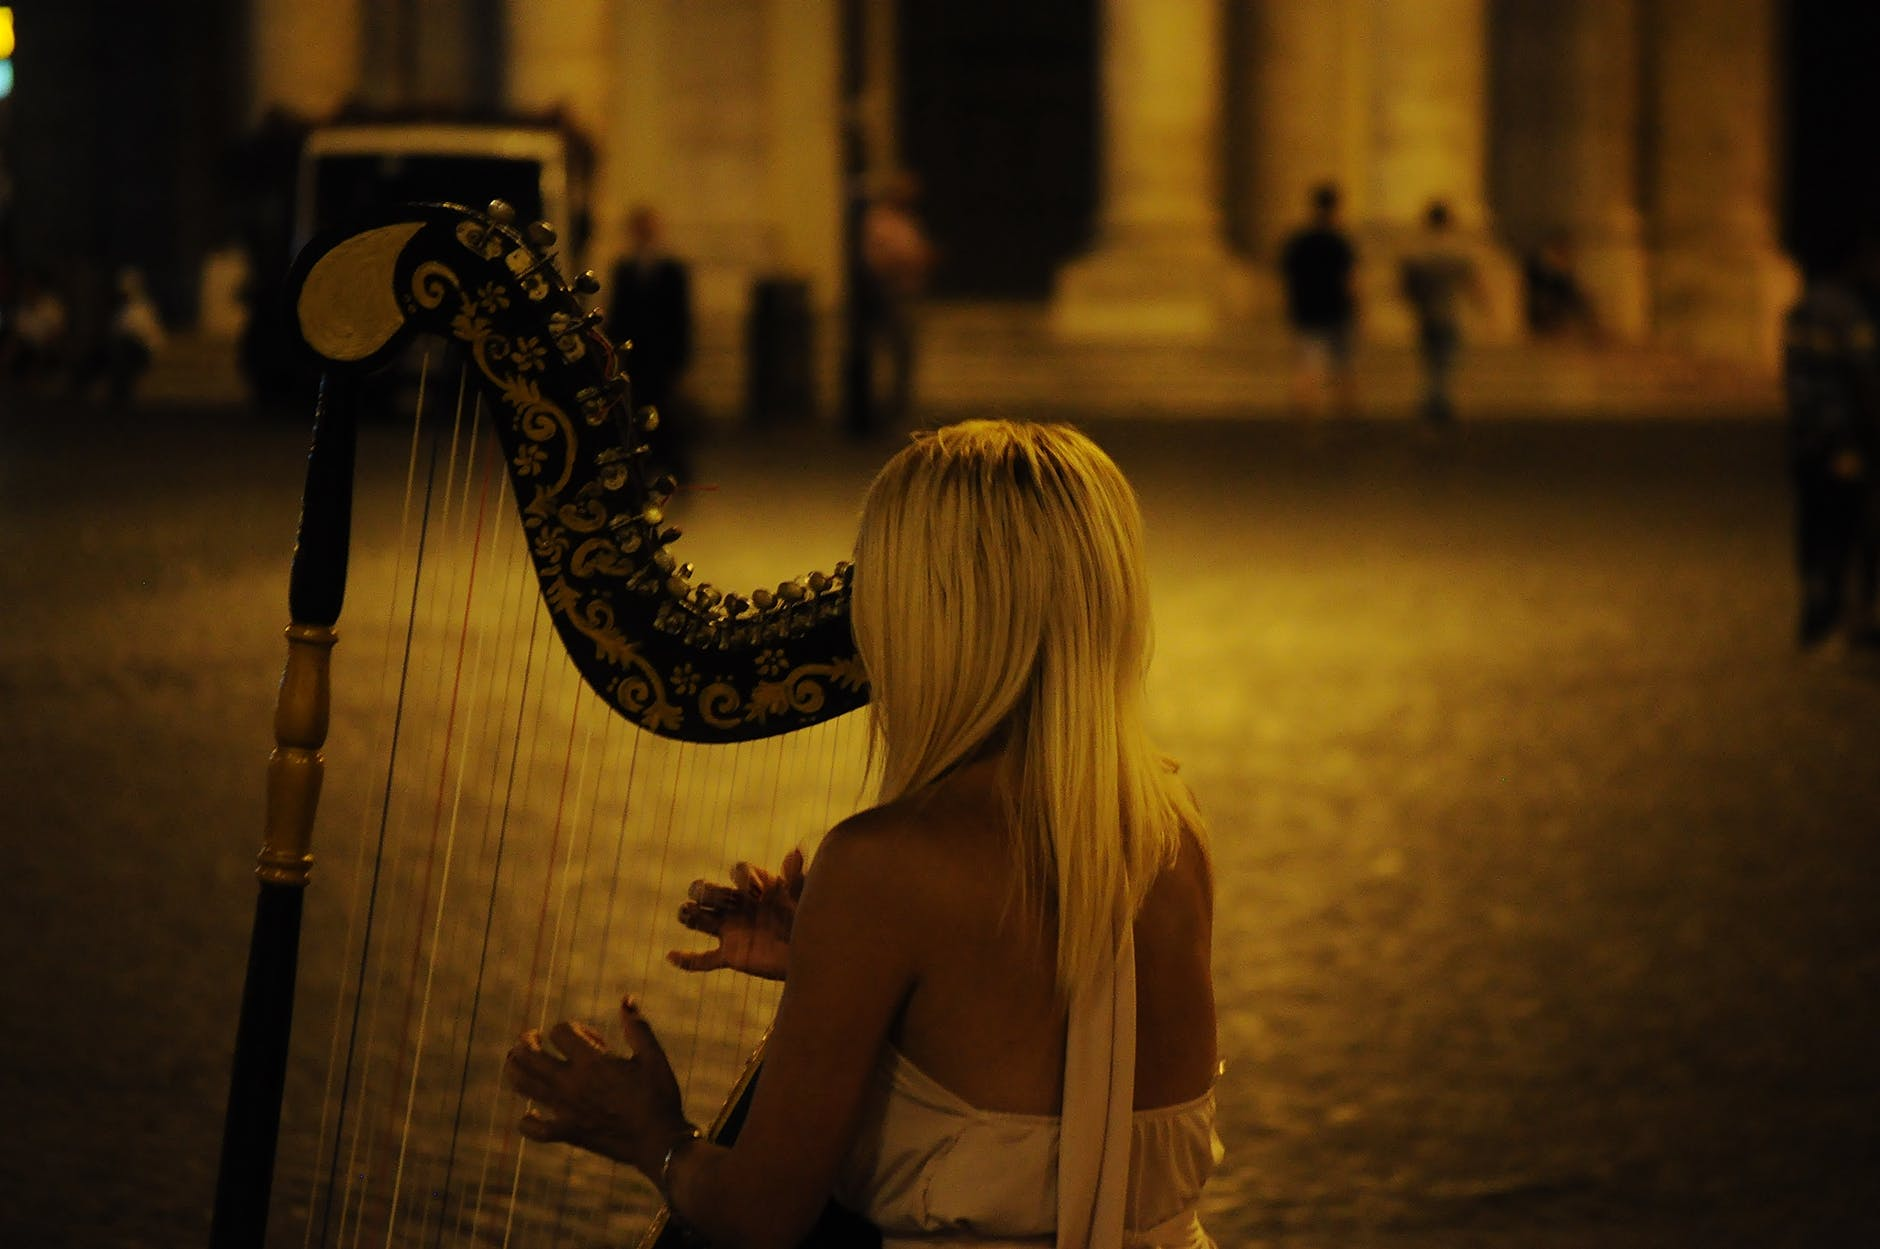 person woman music musician